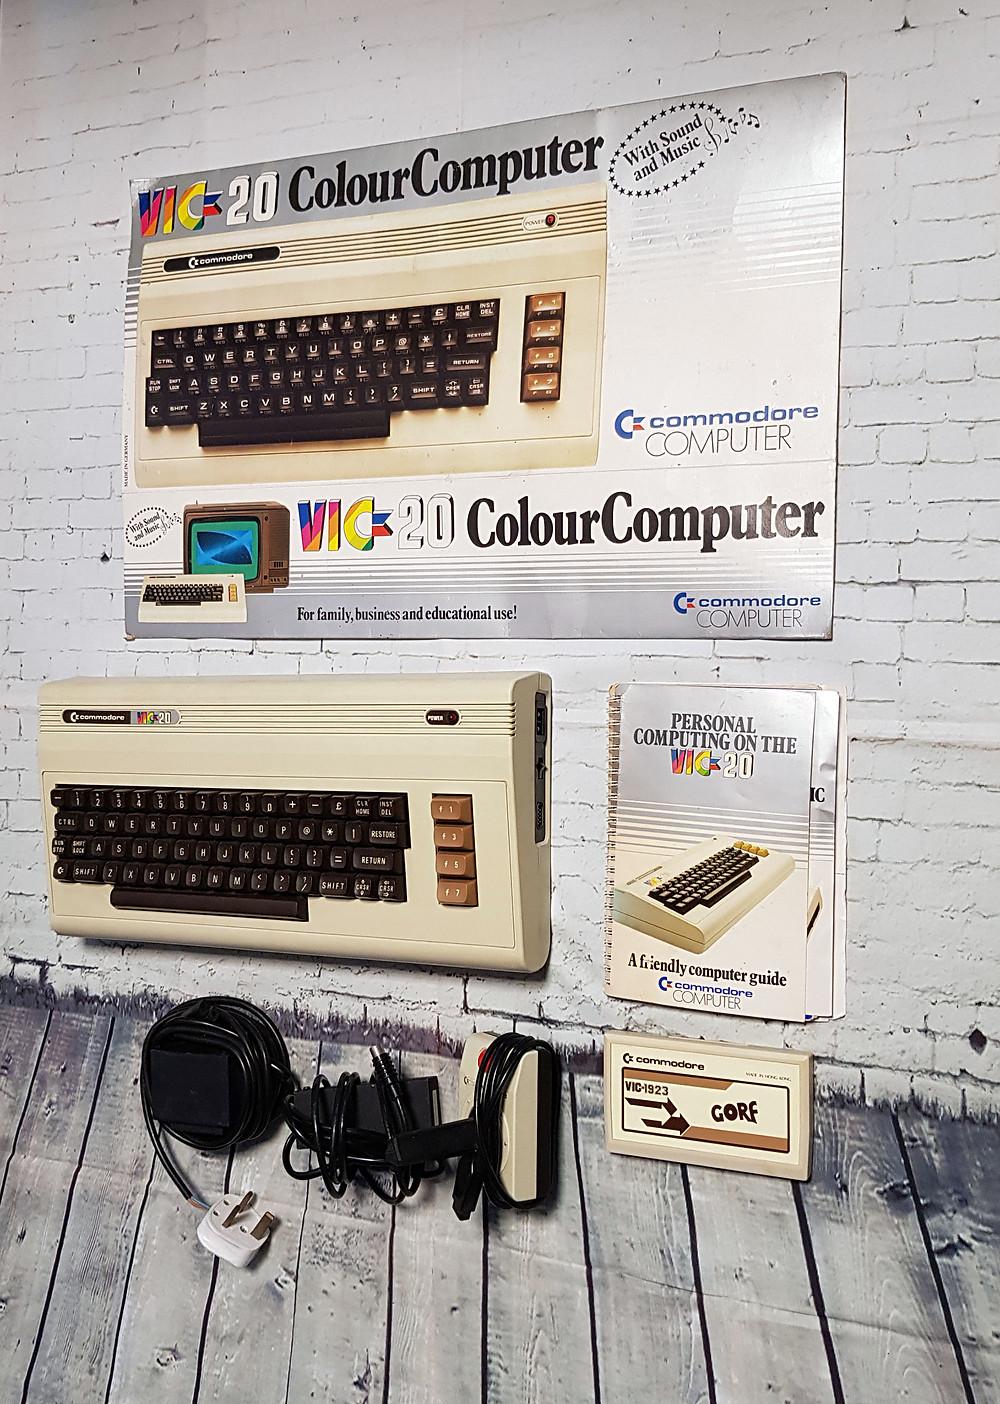 1980s Vintage Commodore VIC-20 Colour Computer Retro Gaming